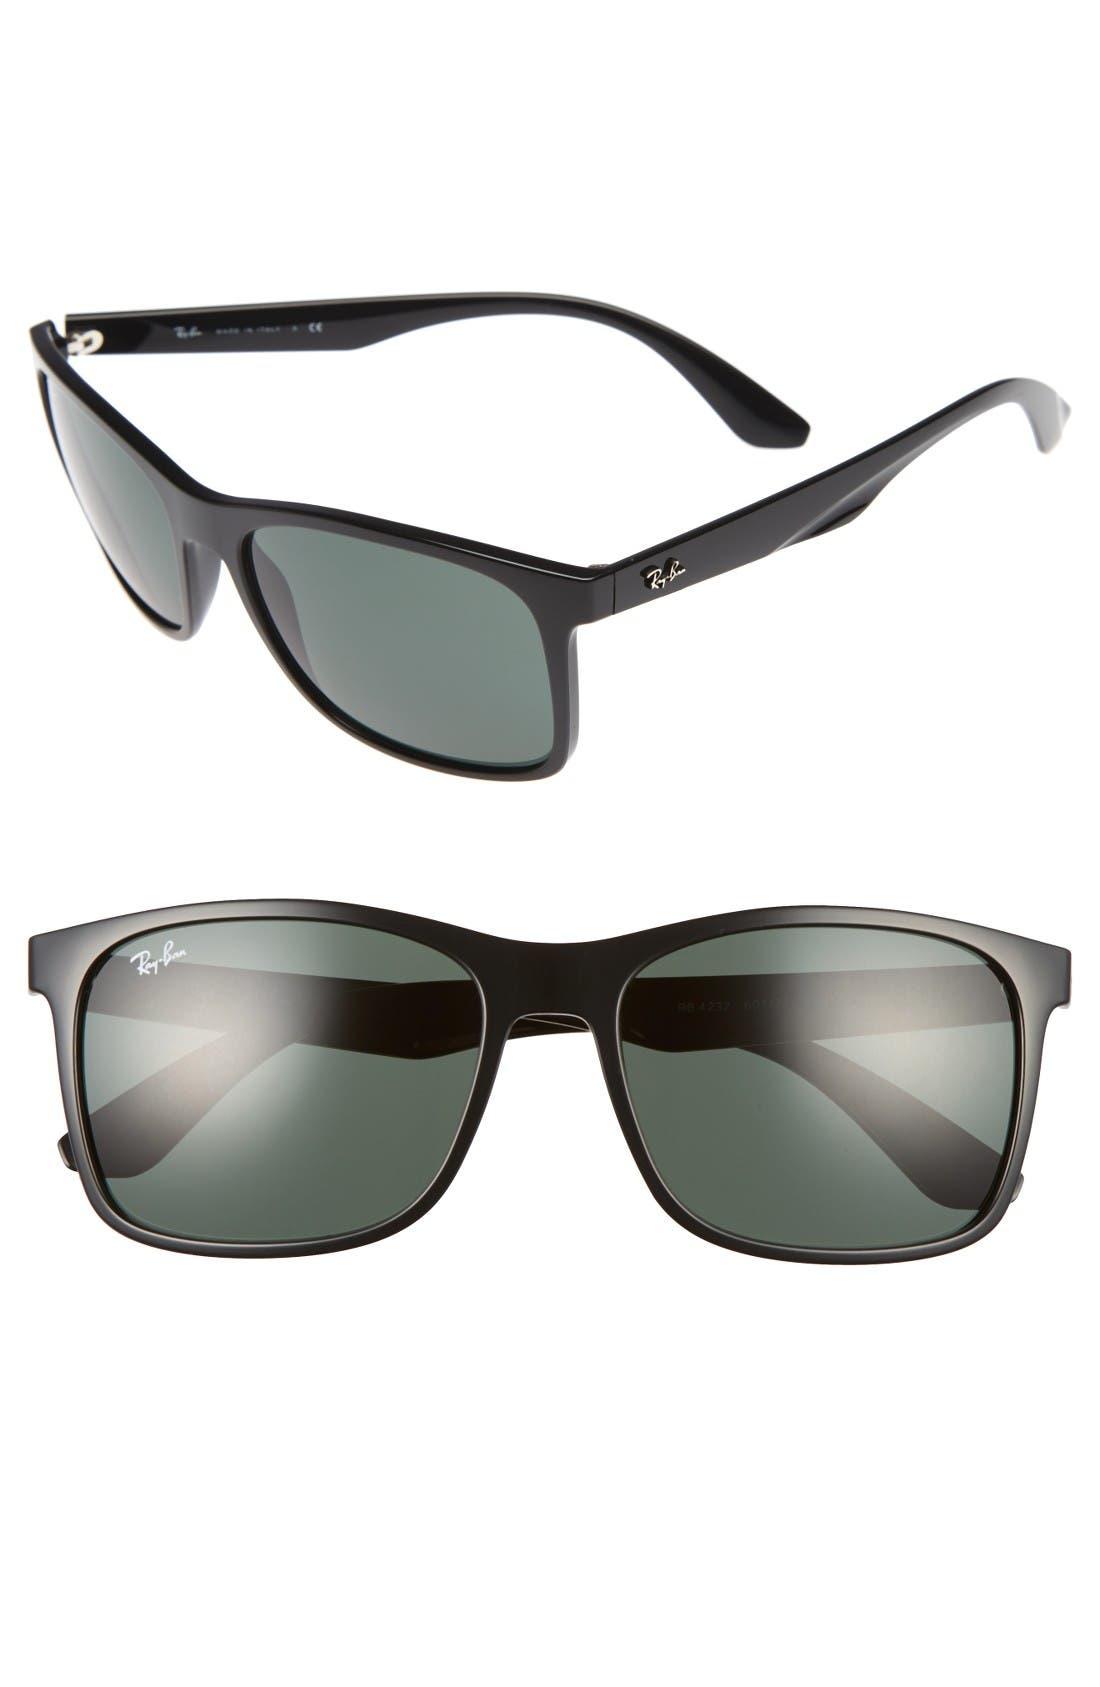 57mm Square Sunglasses,                         Main,                         color, Black / Grey Green